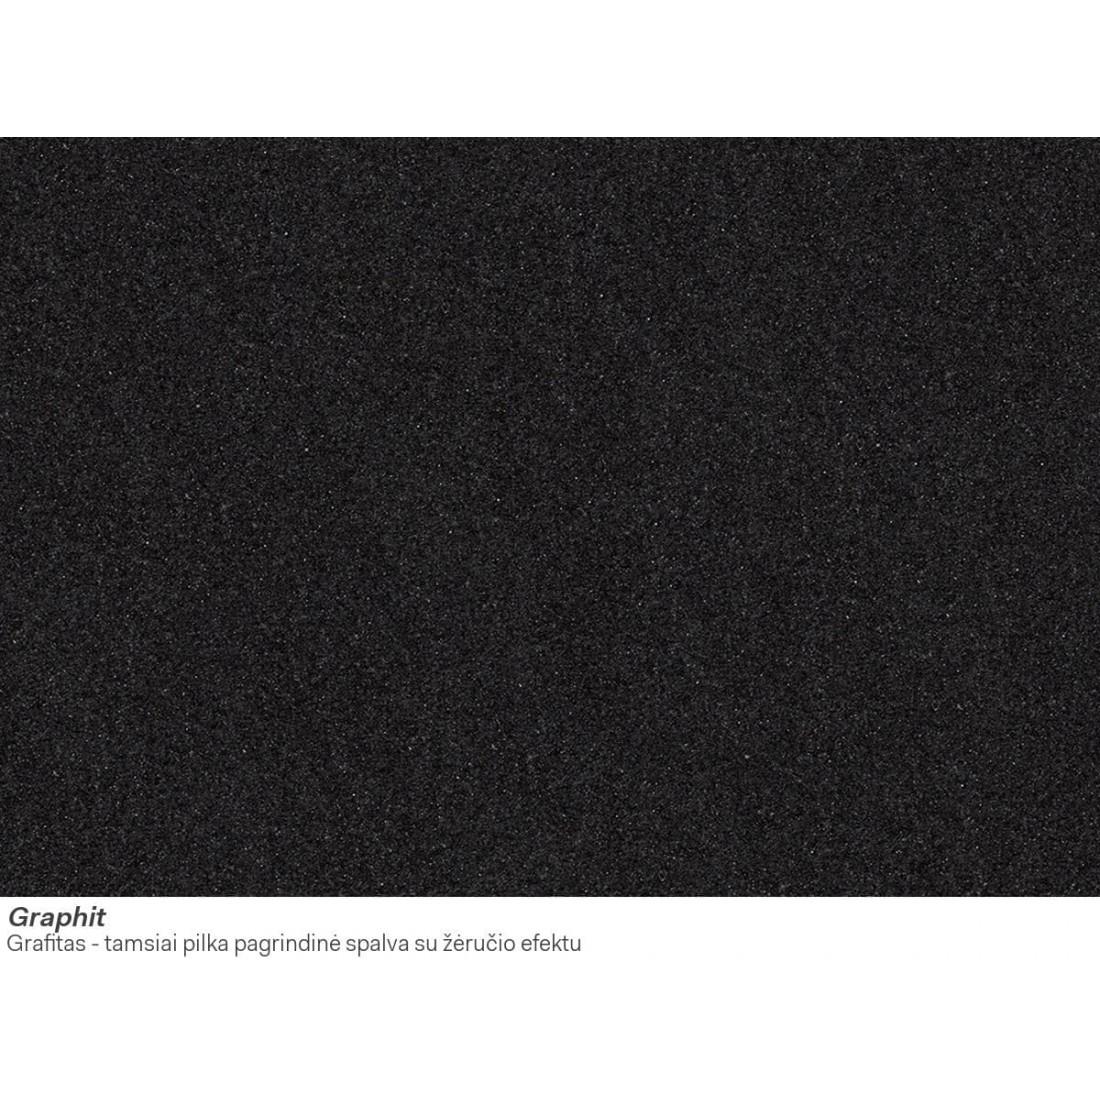 Akmens masės plautuvė Franke Maris MRG 611-100 XL, Graphit